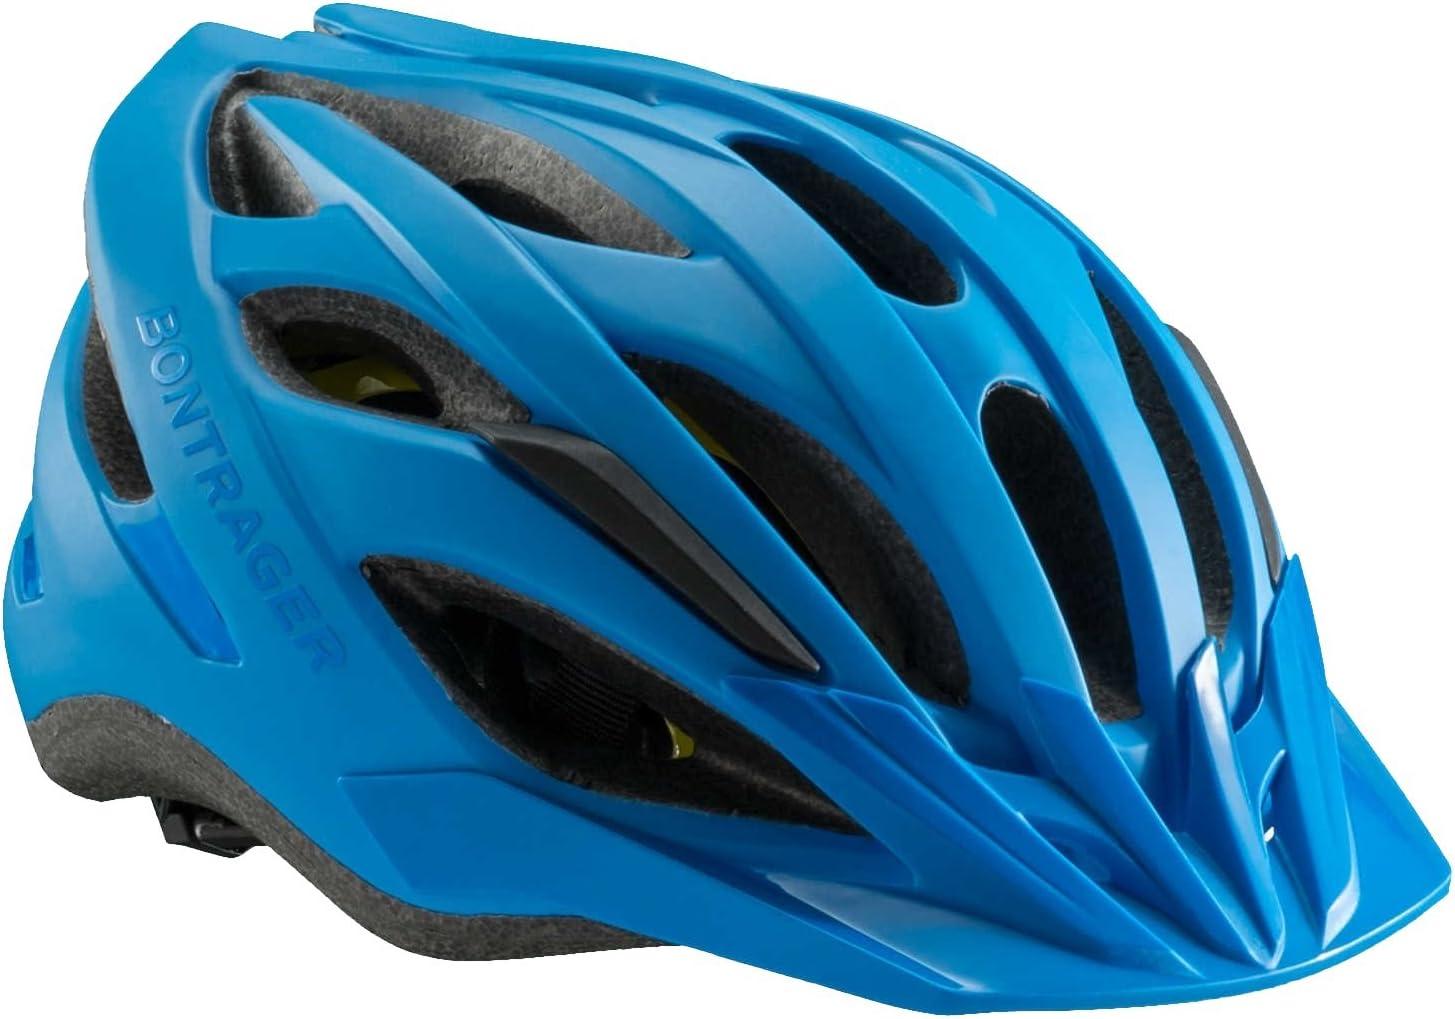 BONTRAGER Solstice MIPS casco para bicicleta de ciclismo – azul ...